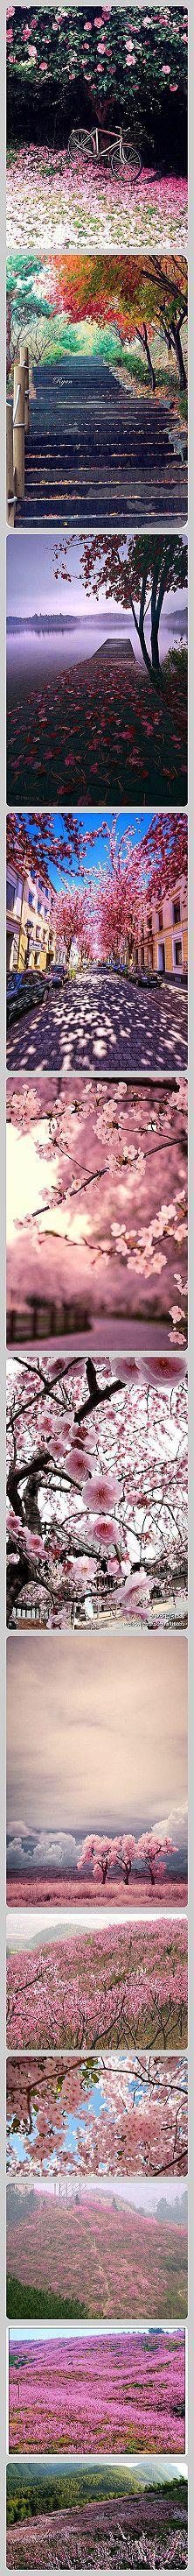 pink flower everywhere you turn